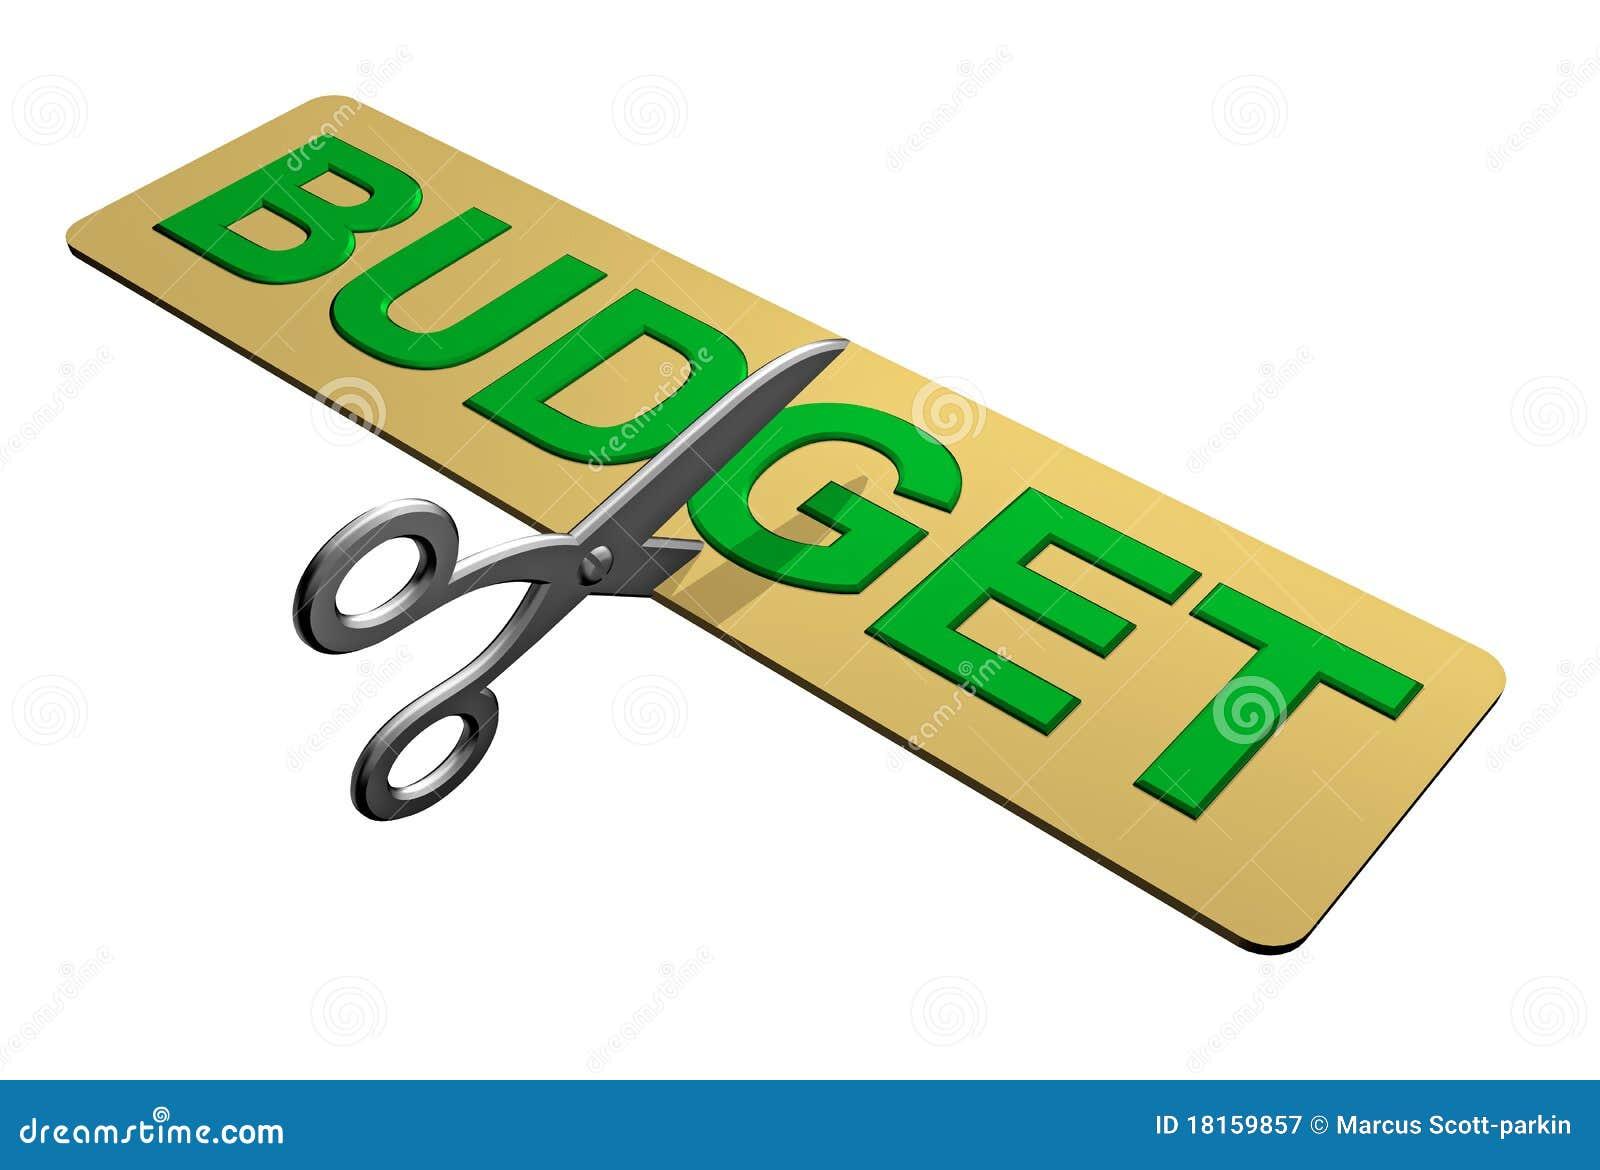 Budget- cutting